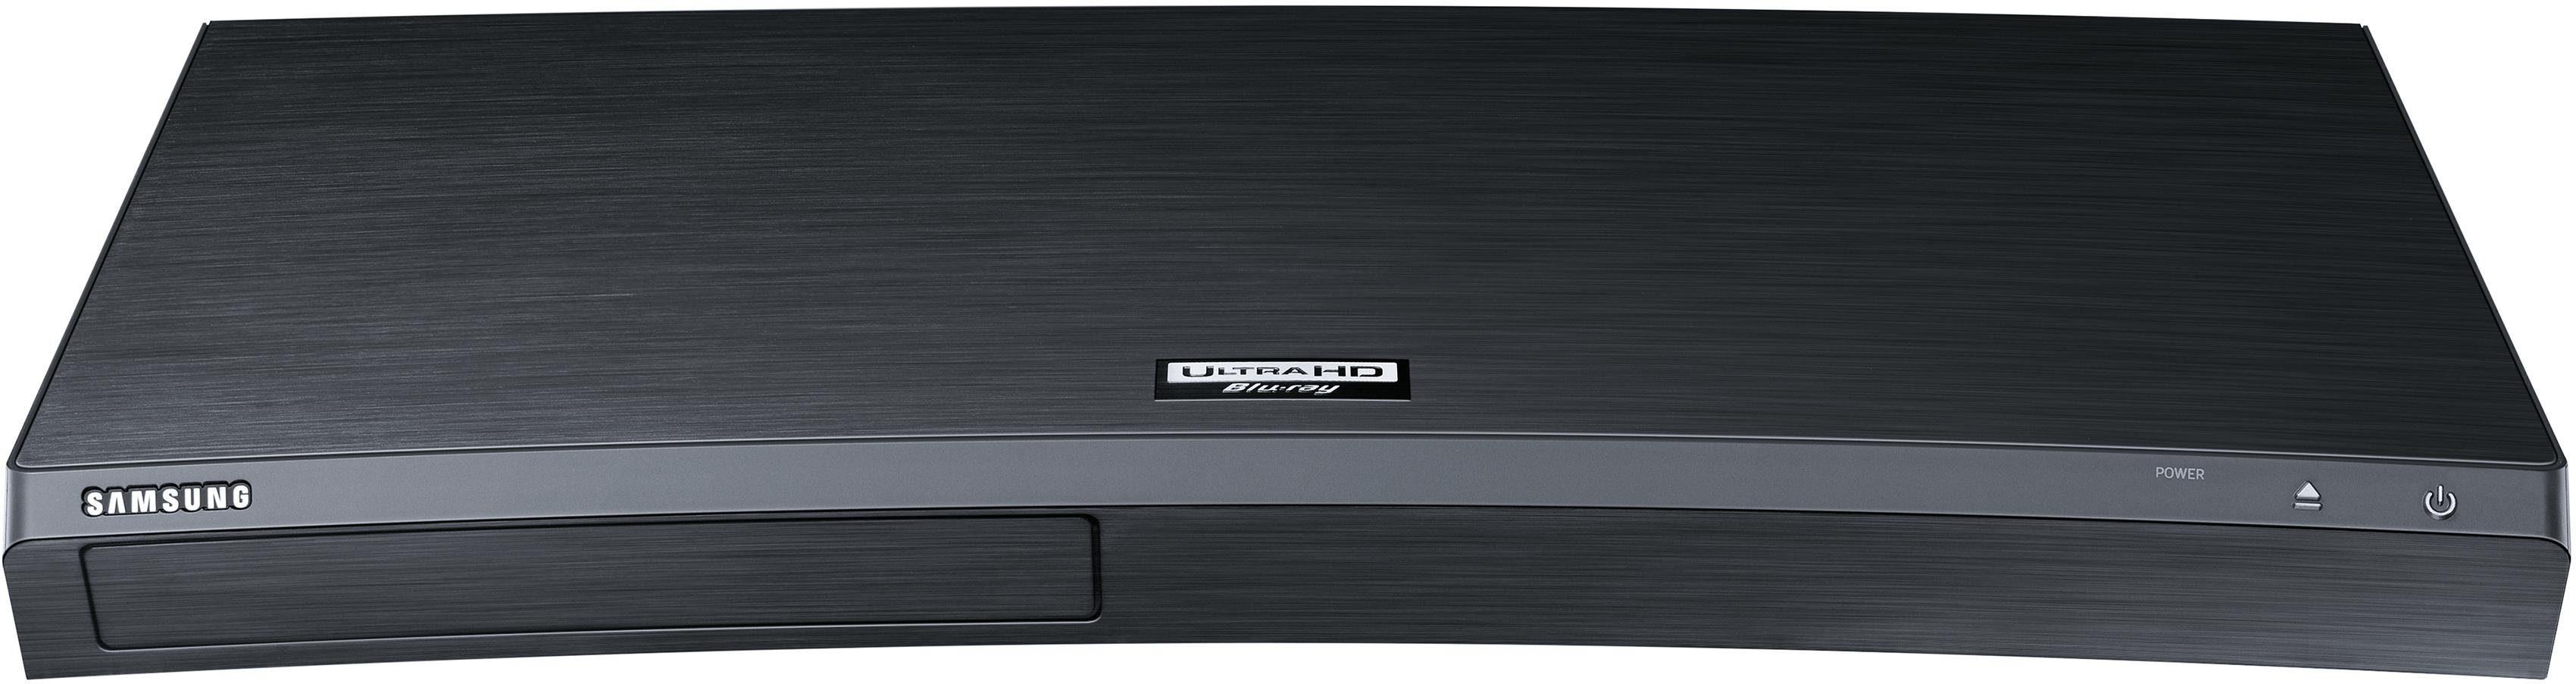 Samsung UBD-9500/EN Ultra-HD Blu Ray Player (Bluetooth, WLAN)